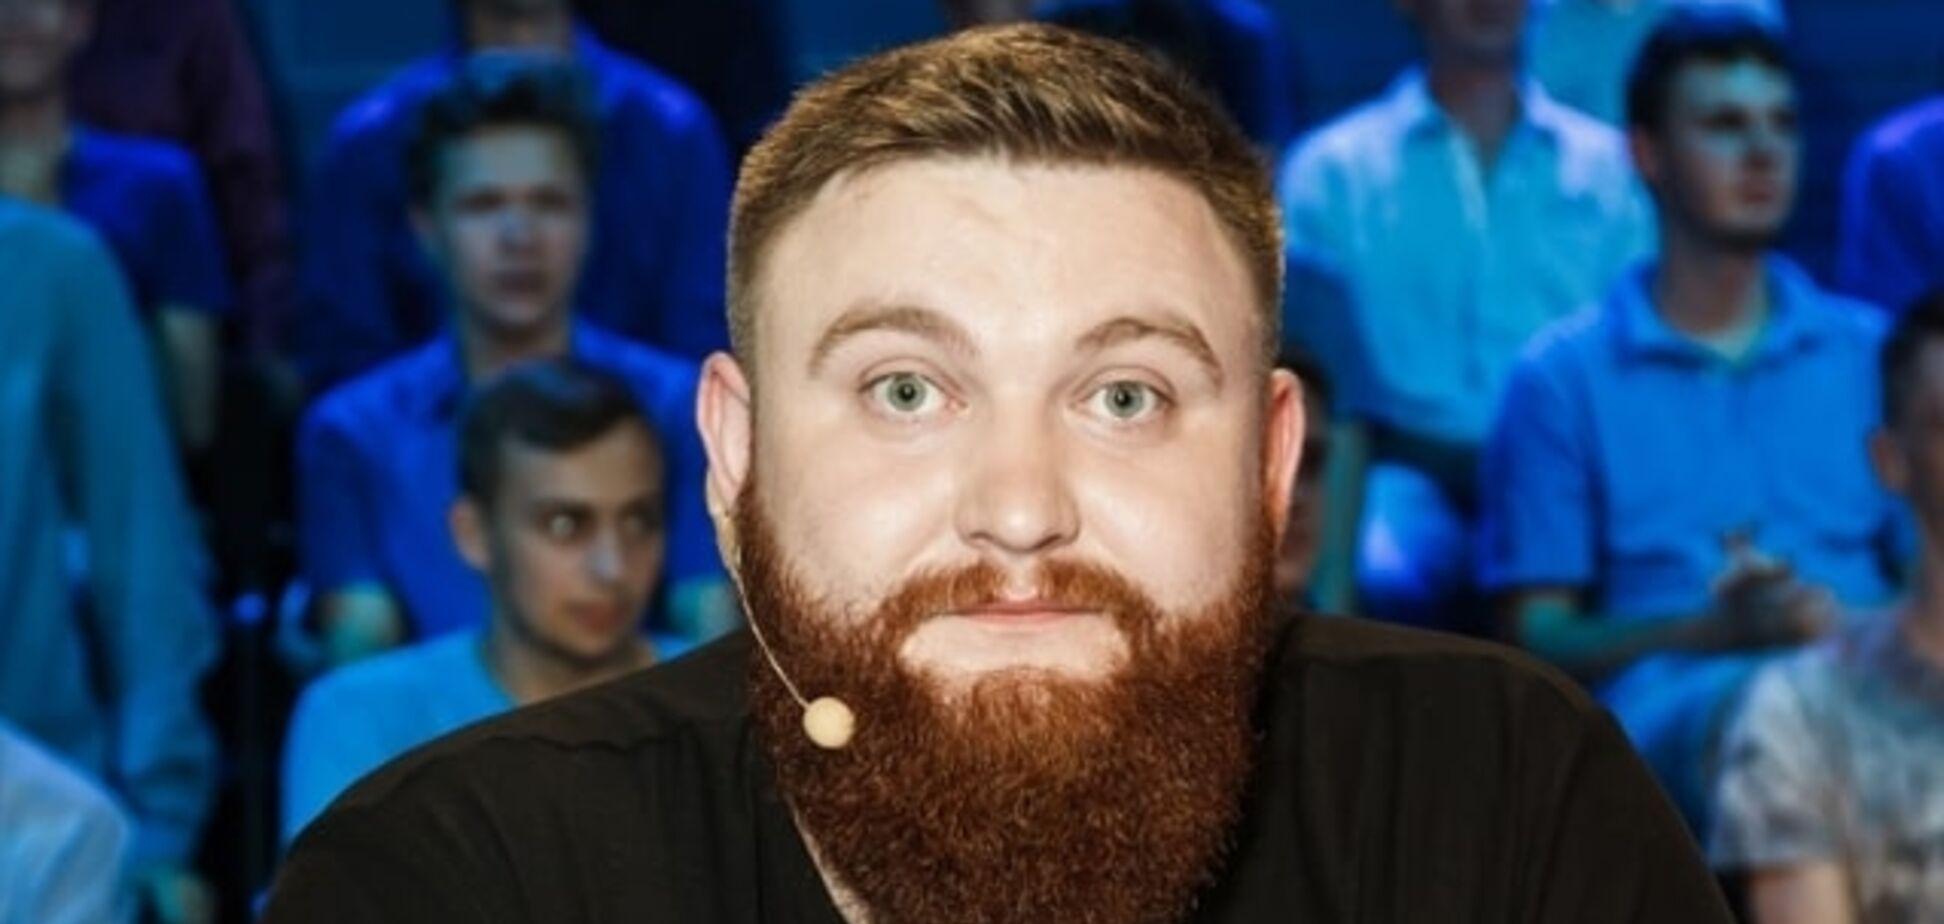 Звезда 'Вар'яти-шоу' впервые станет отцом. Фото